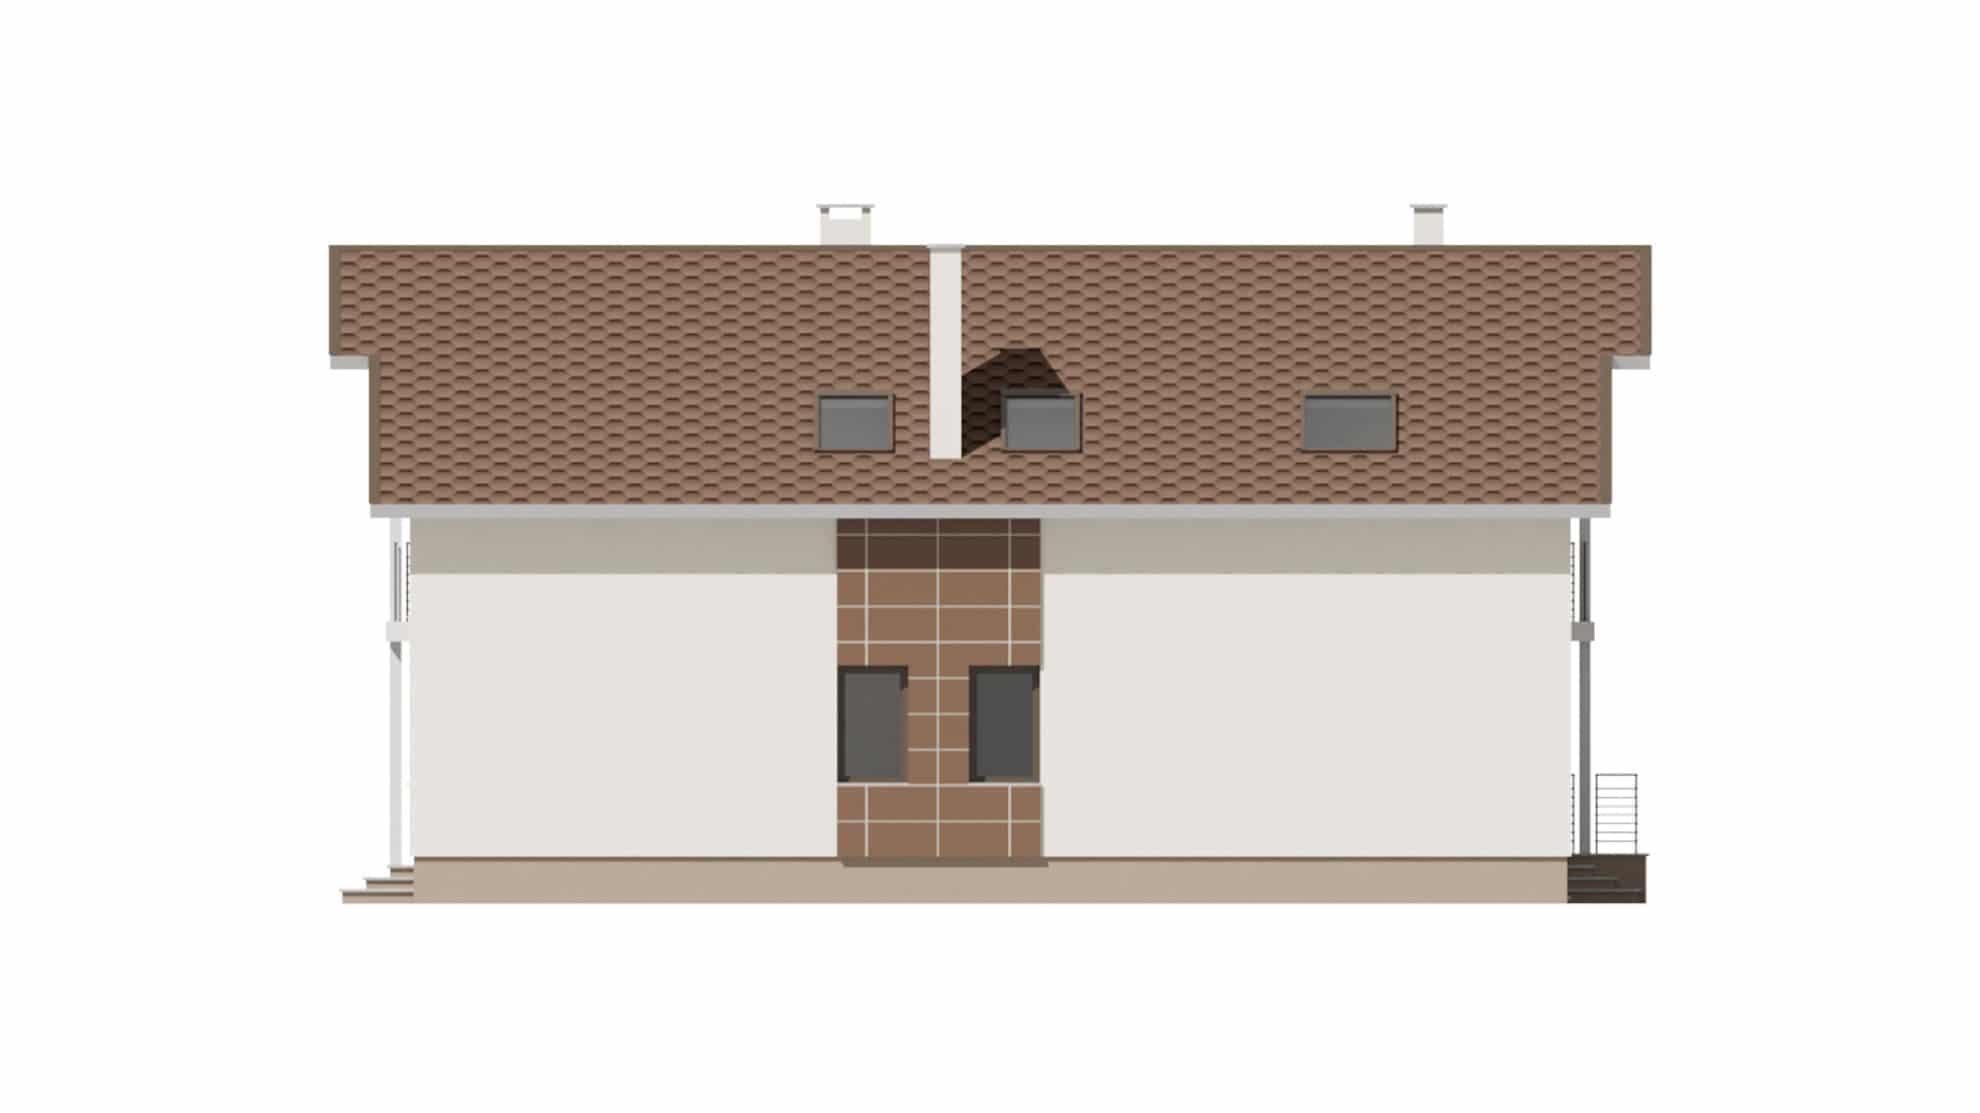 Фасад мансардного дома с гаражом и балконом «КМ-59» - слева